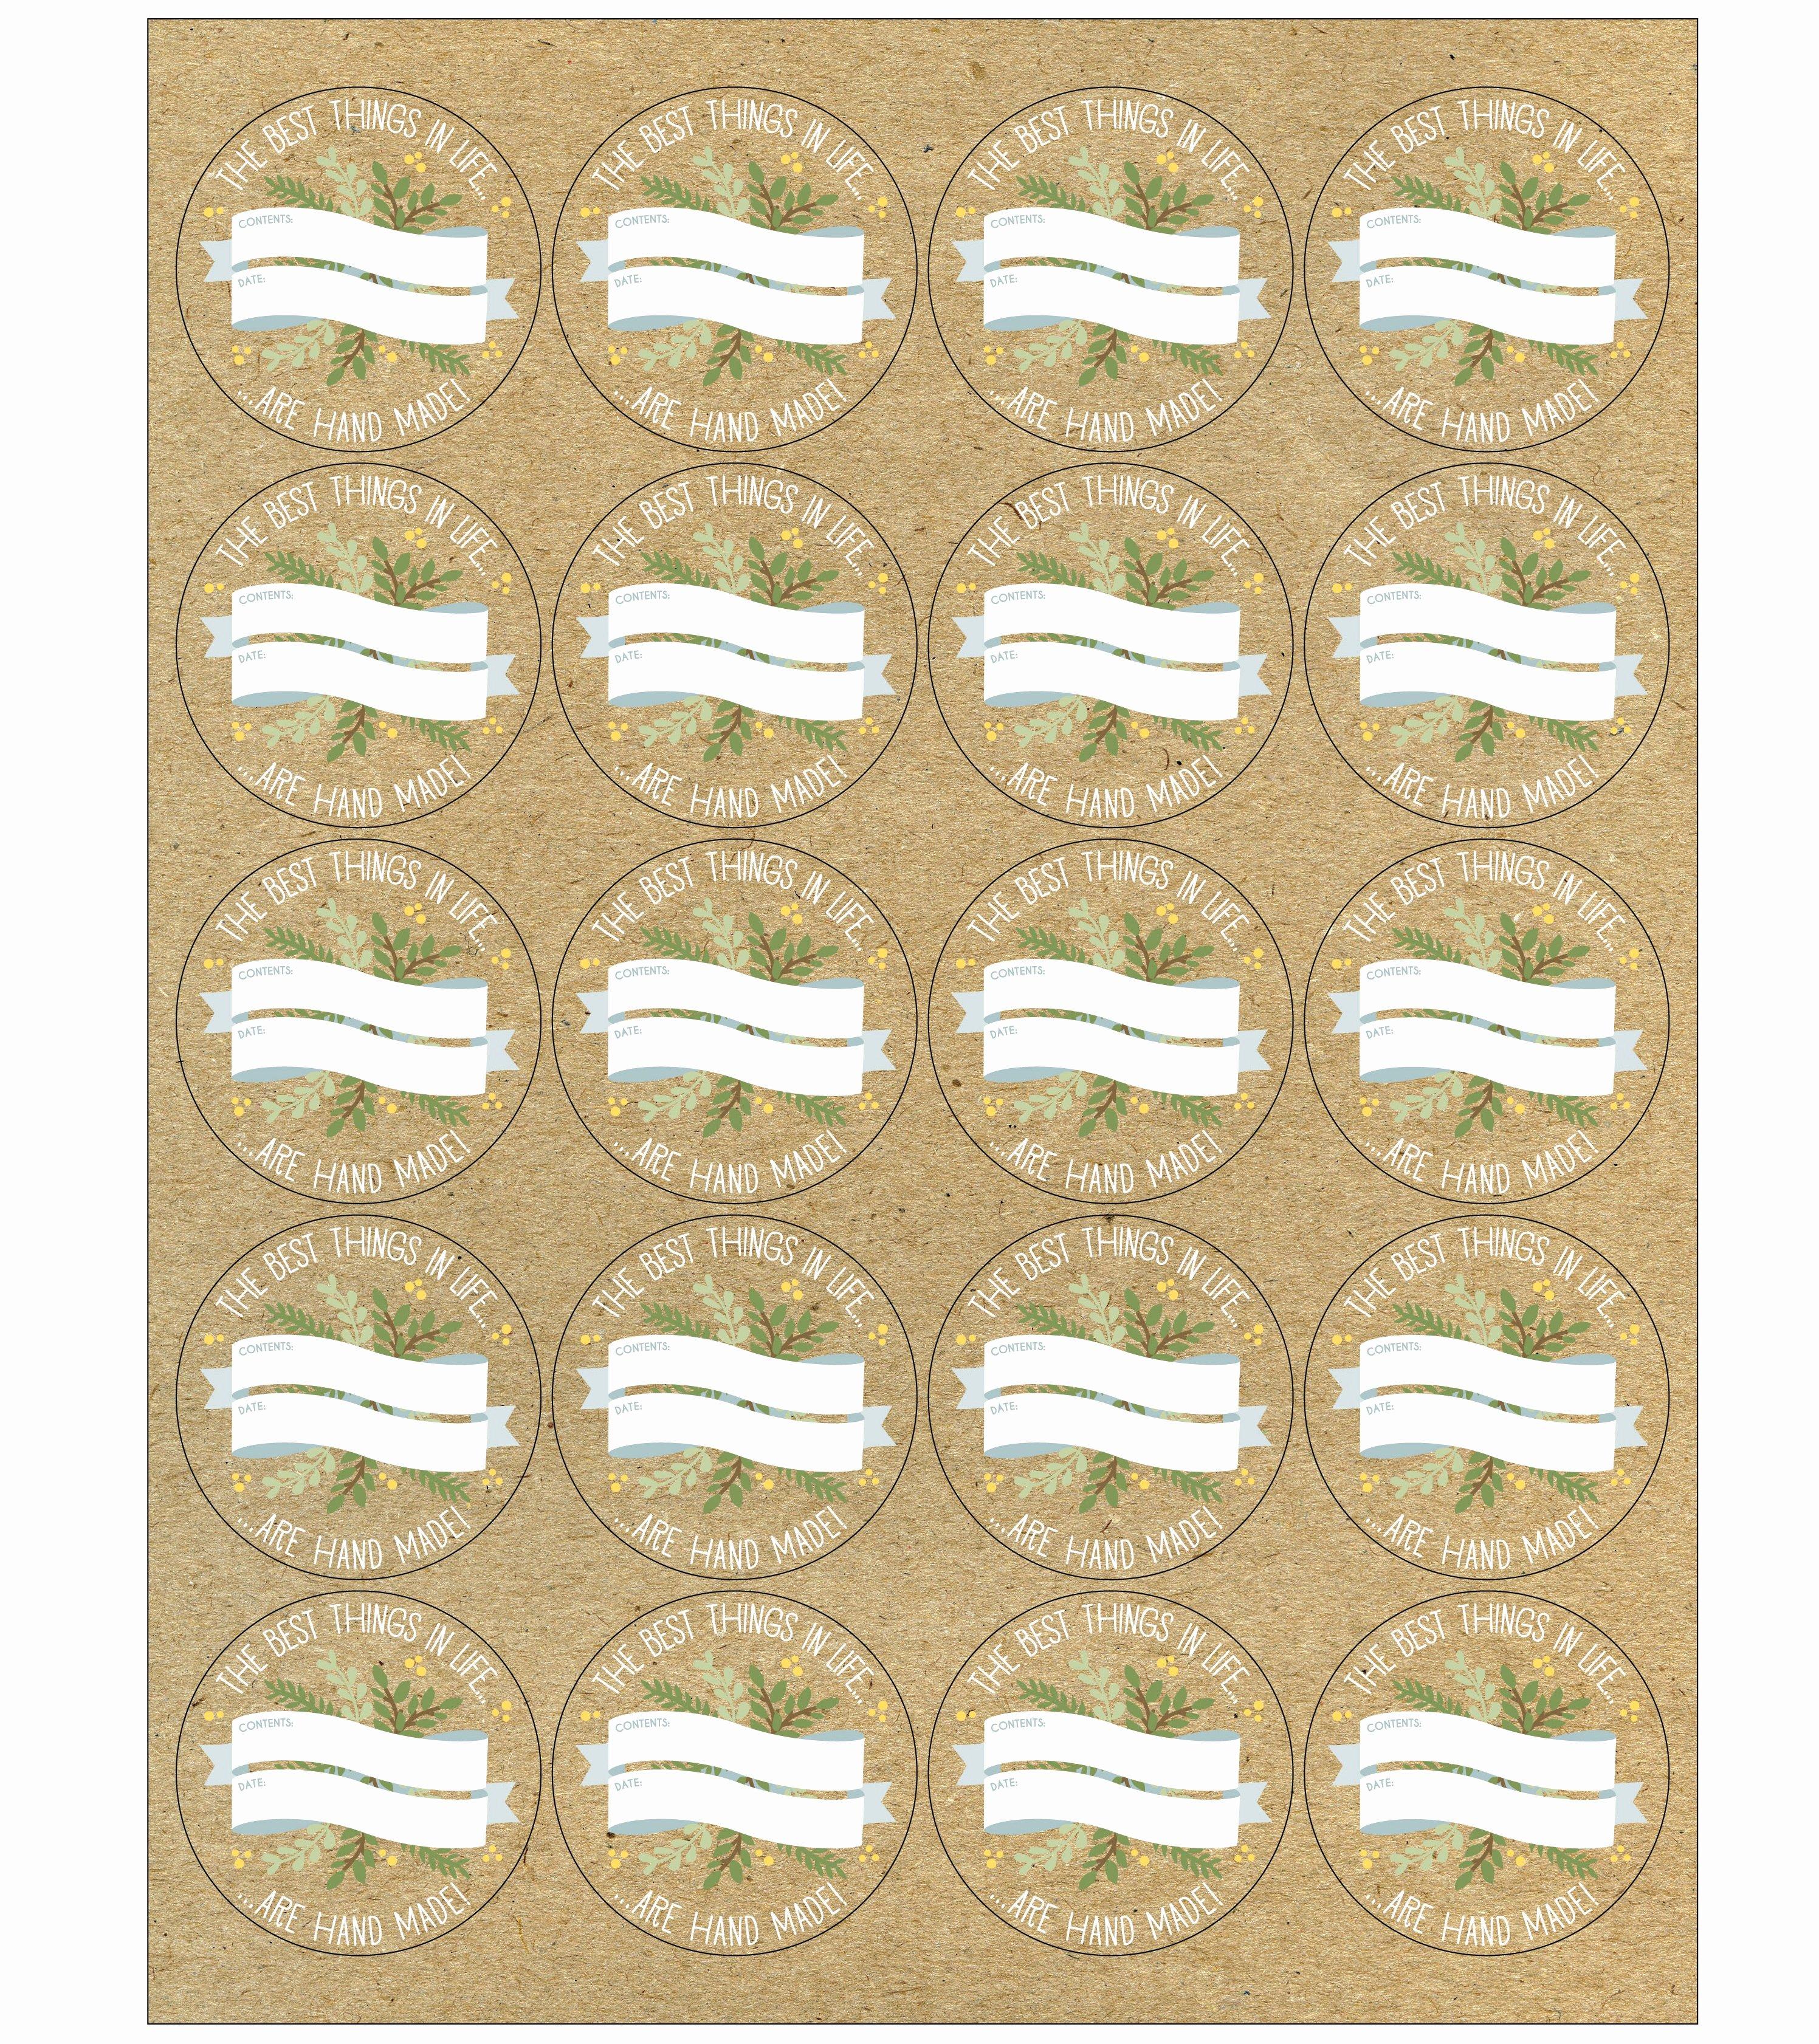 Mason Jar Tags Template Awesome the Worldlabel Mason Jar Label Design Contest